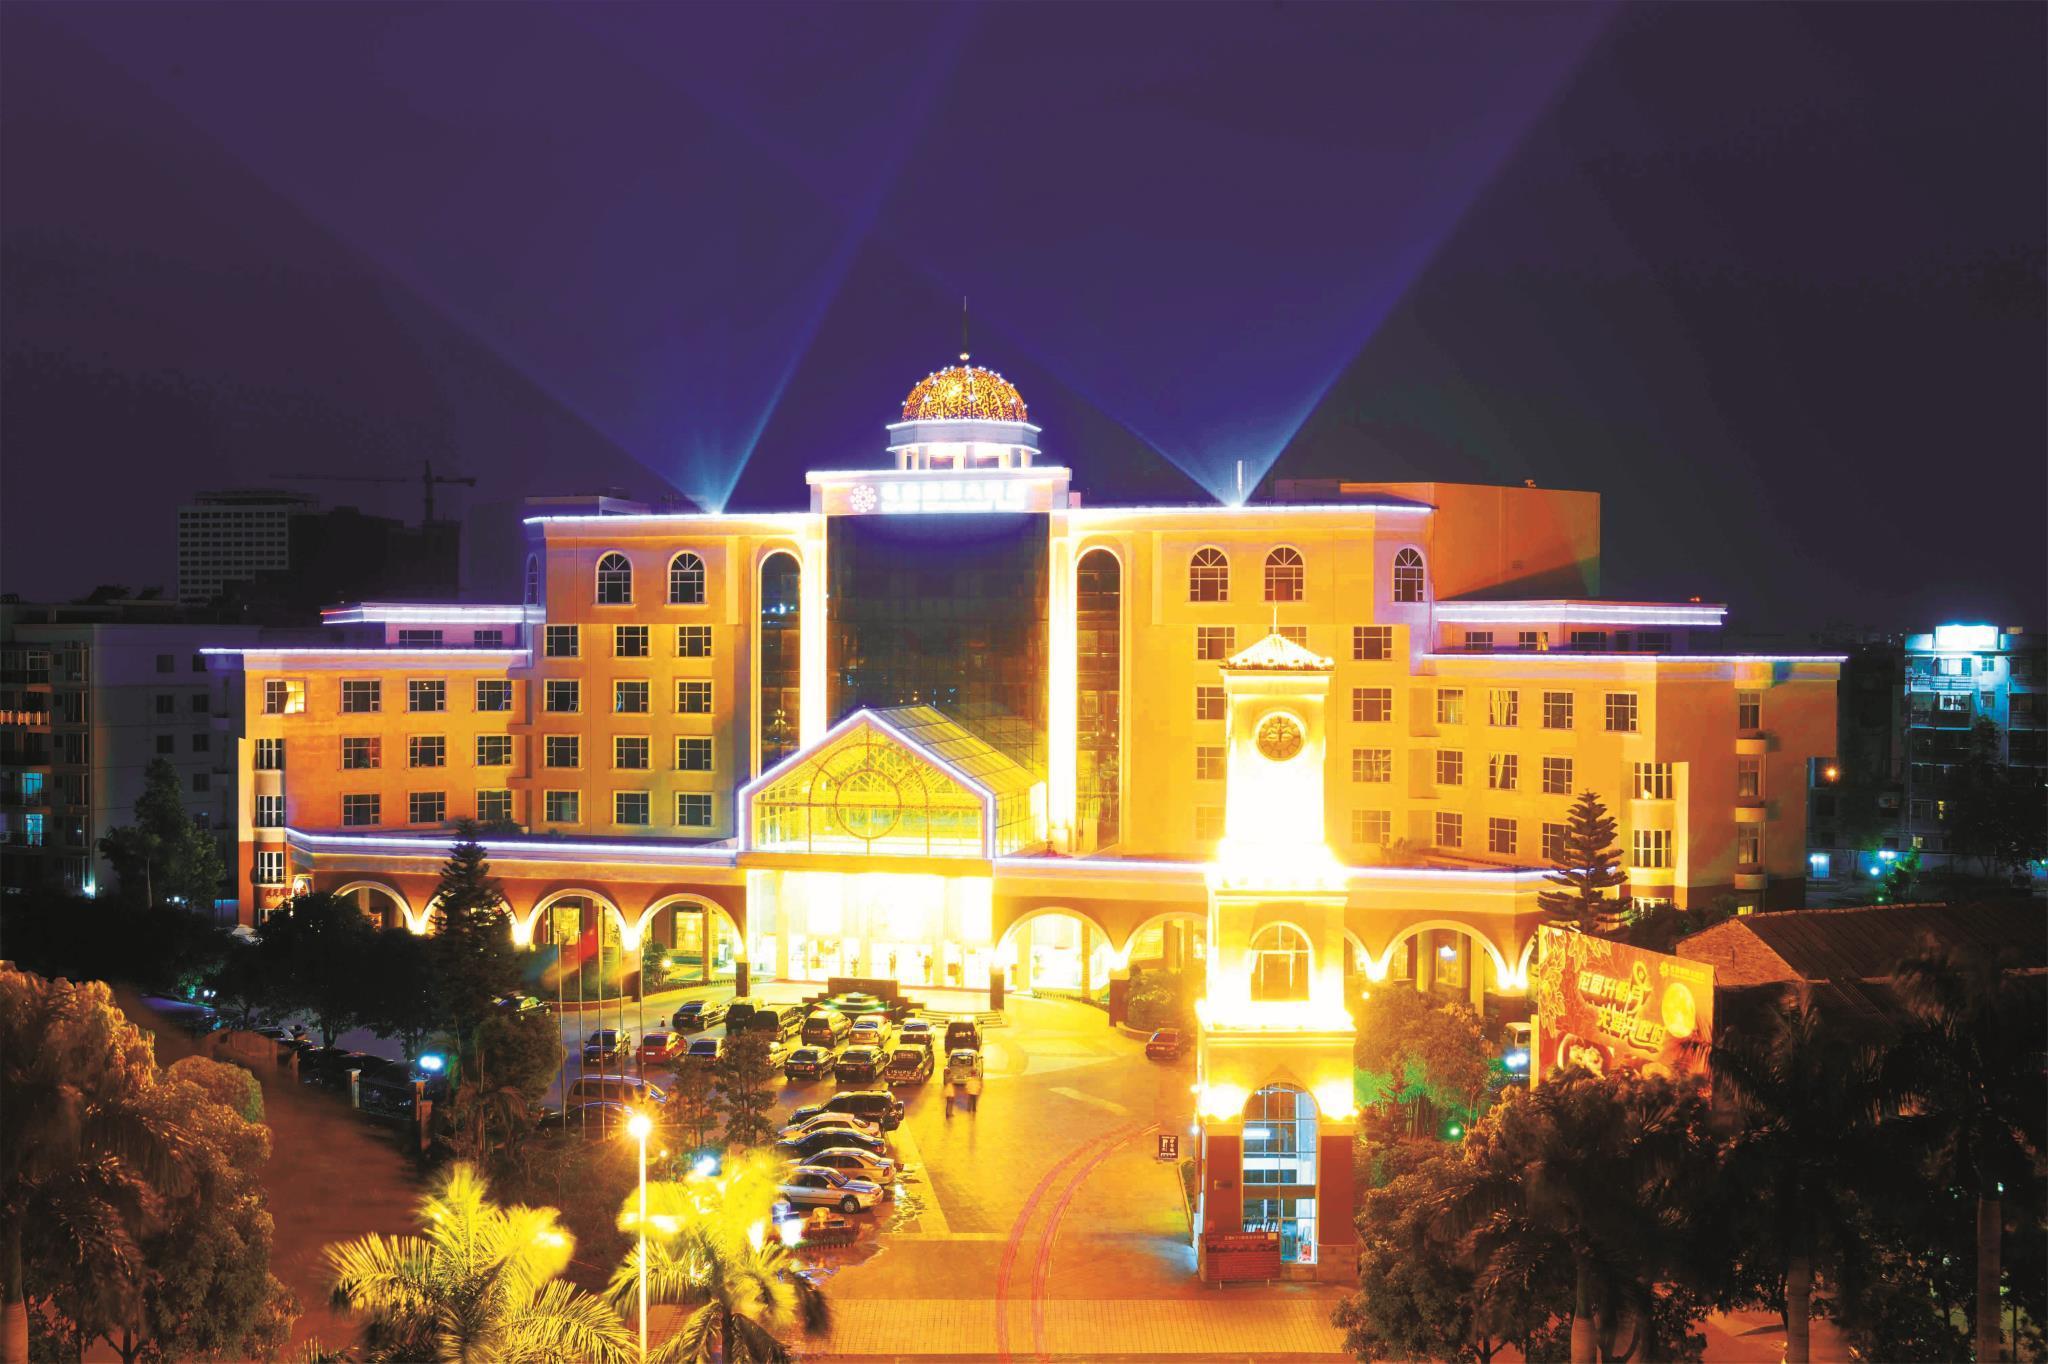 Yulin Garden International Hotel, Yulin